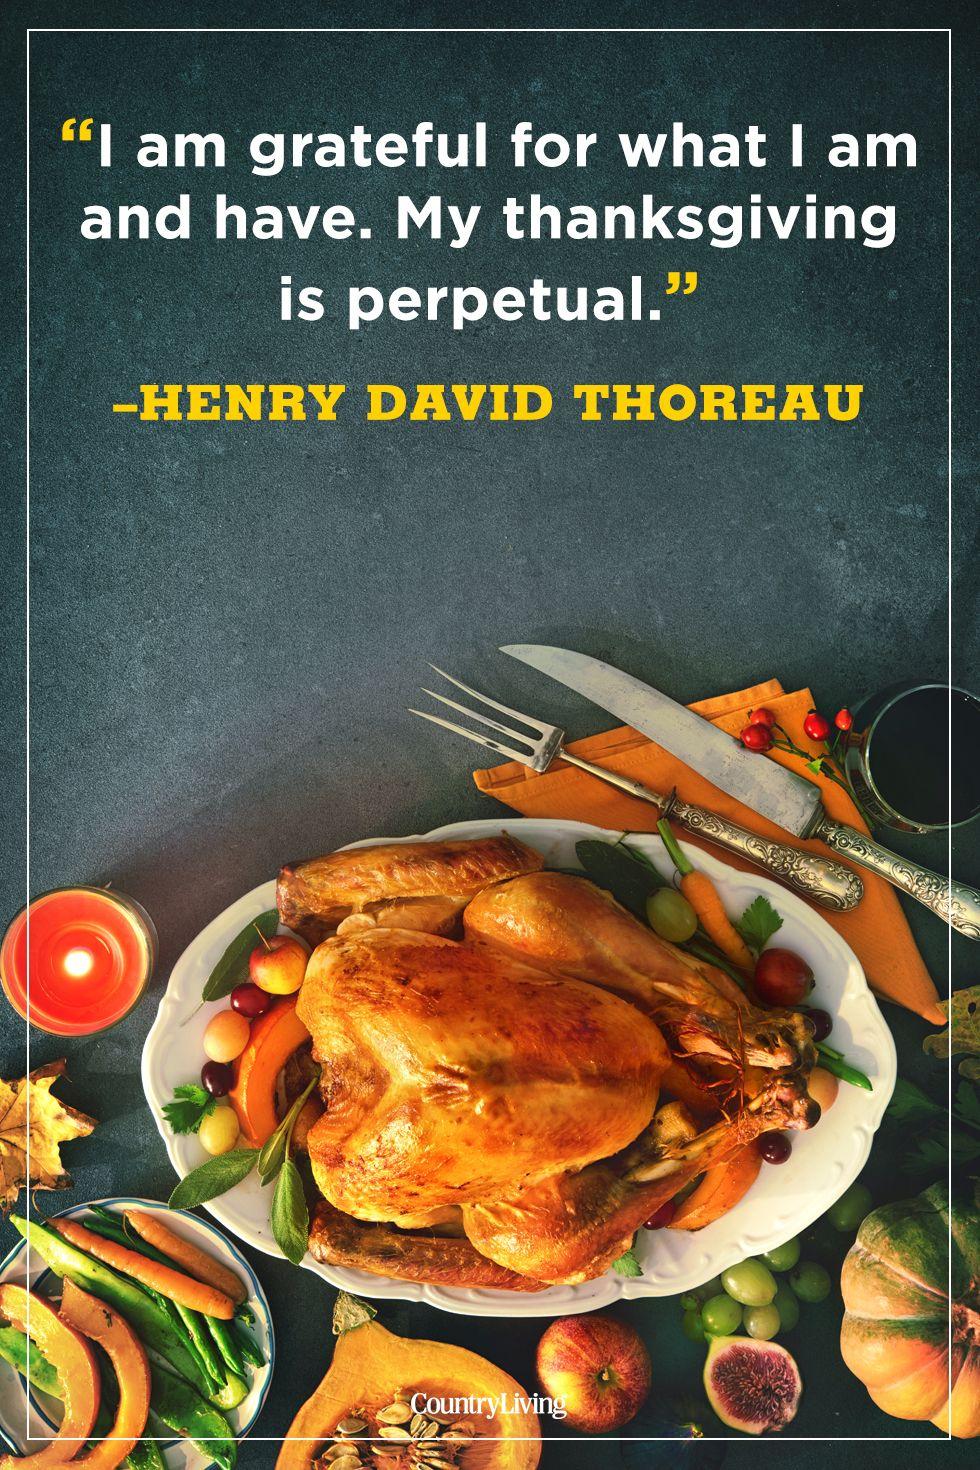 thanksgiving quotes hendry david thoreau